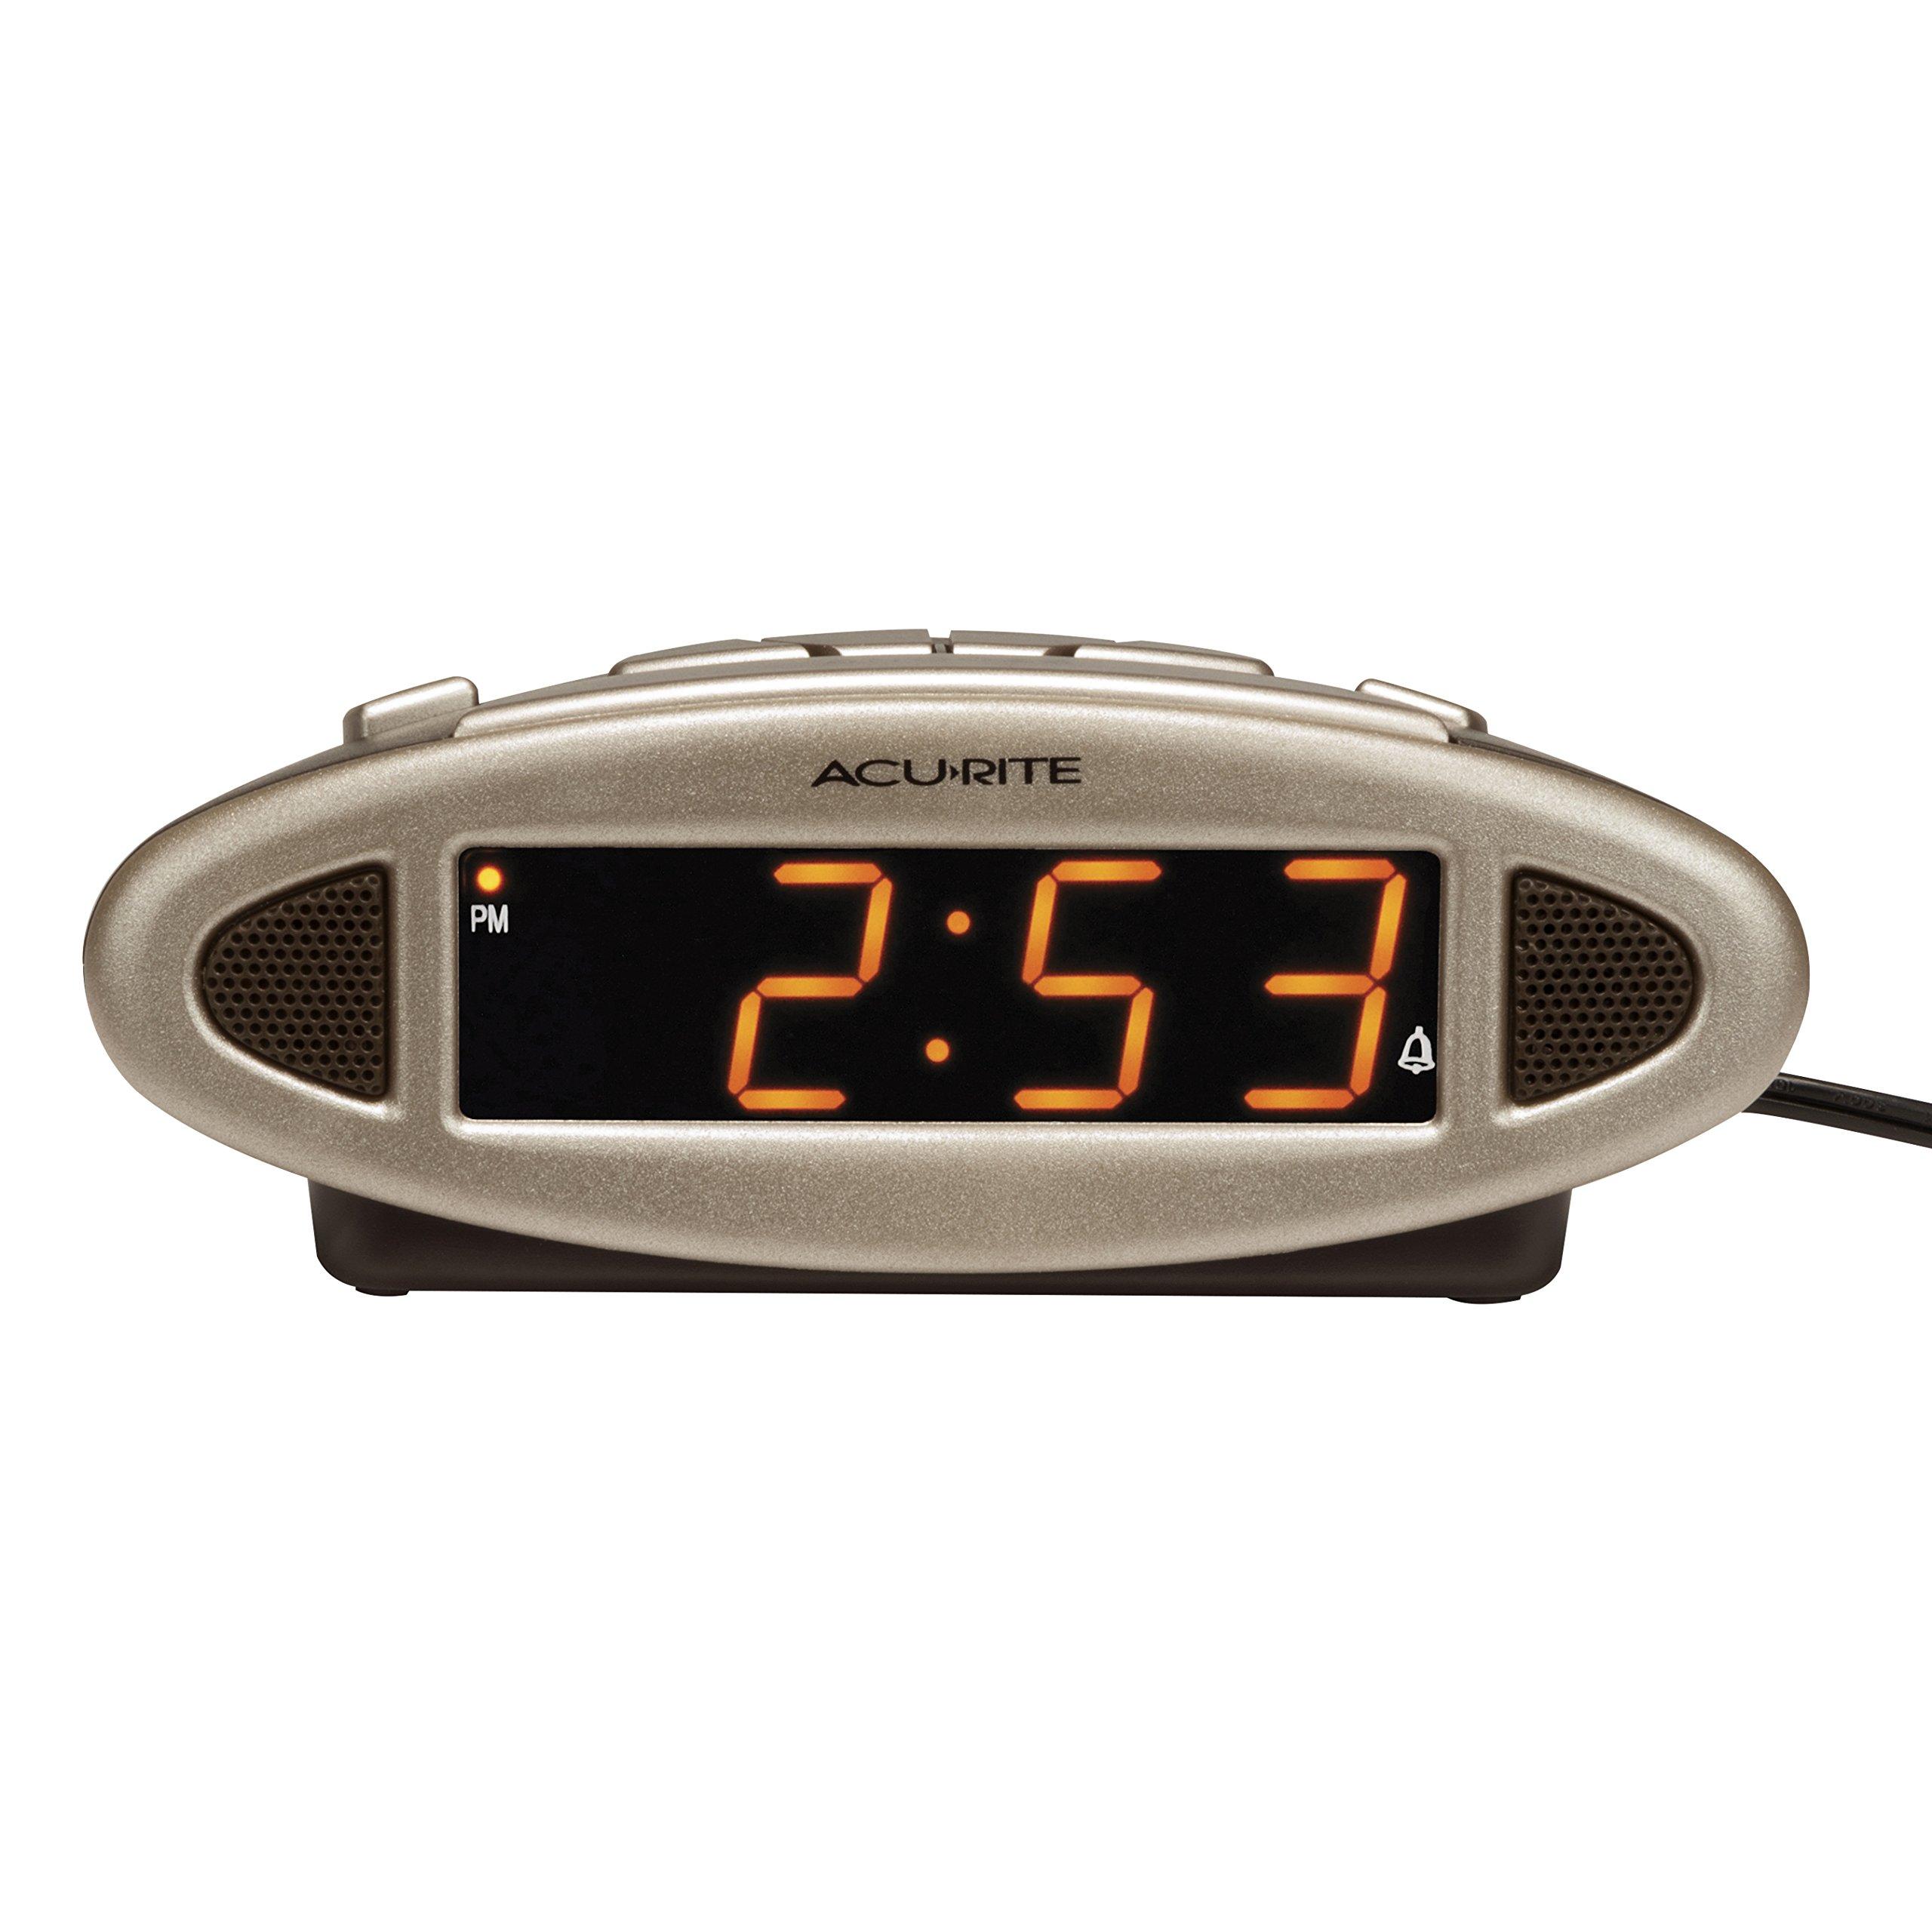 AcuRite 13027A Intelli-Time Digital Alarm Clock by AcuRite